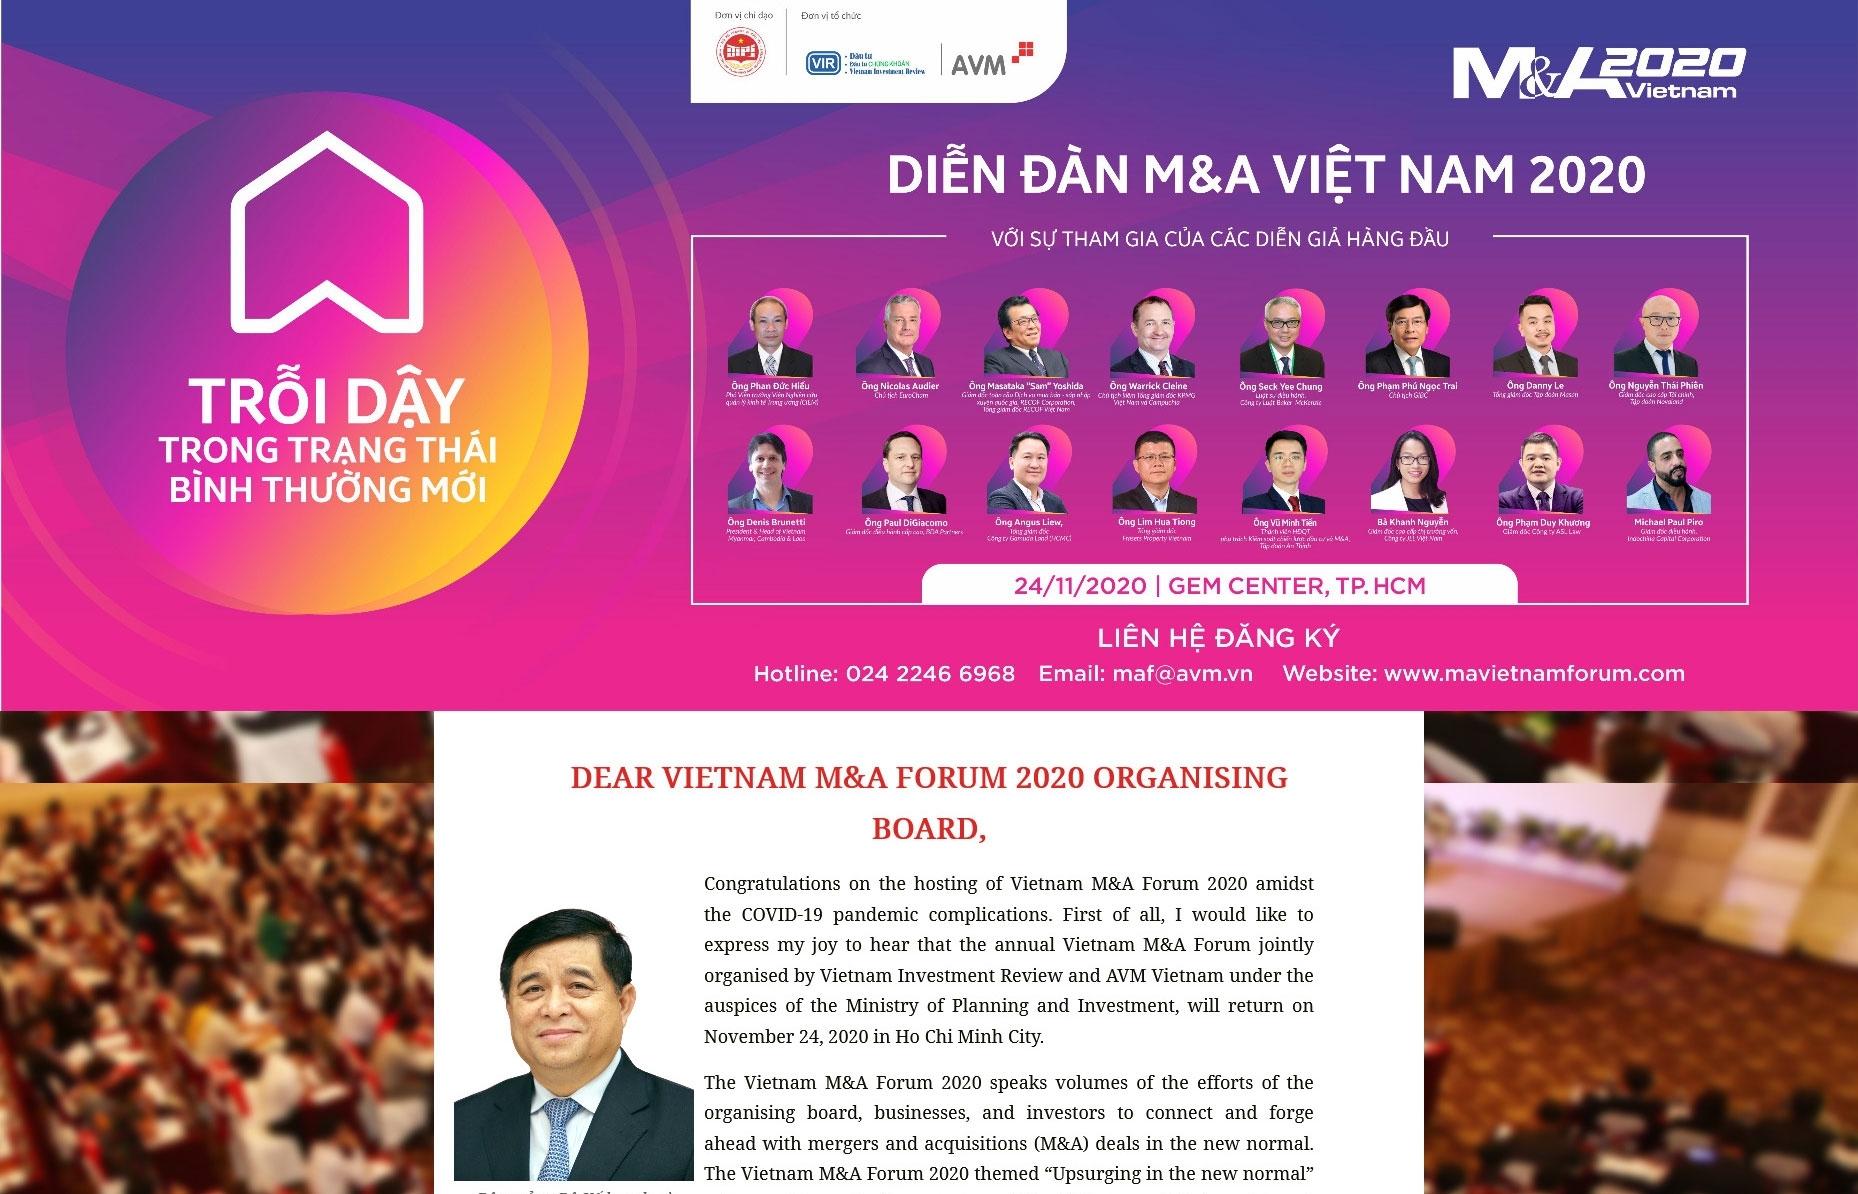 Vietnam M&A Forum 2020 directory